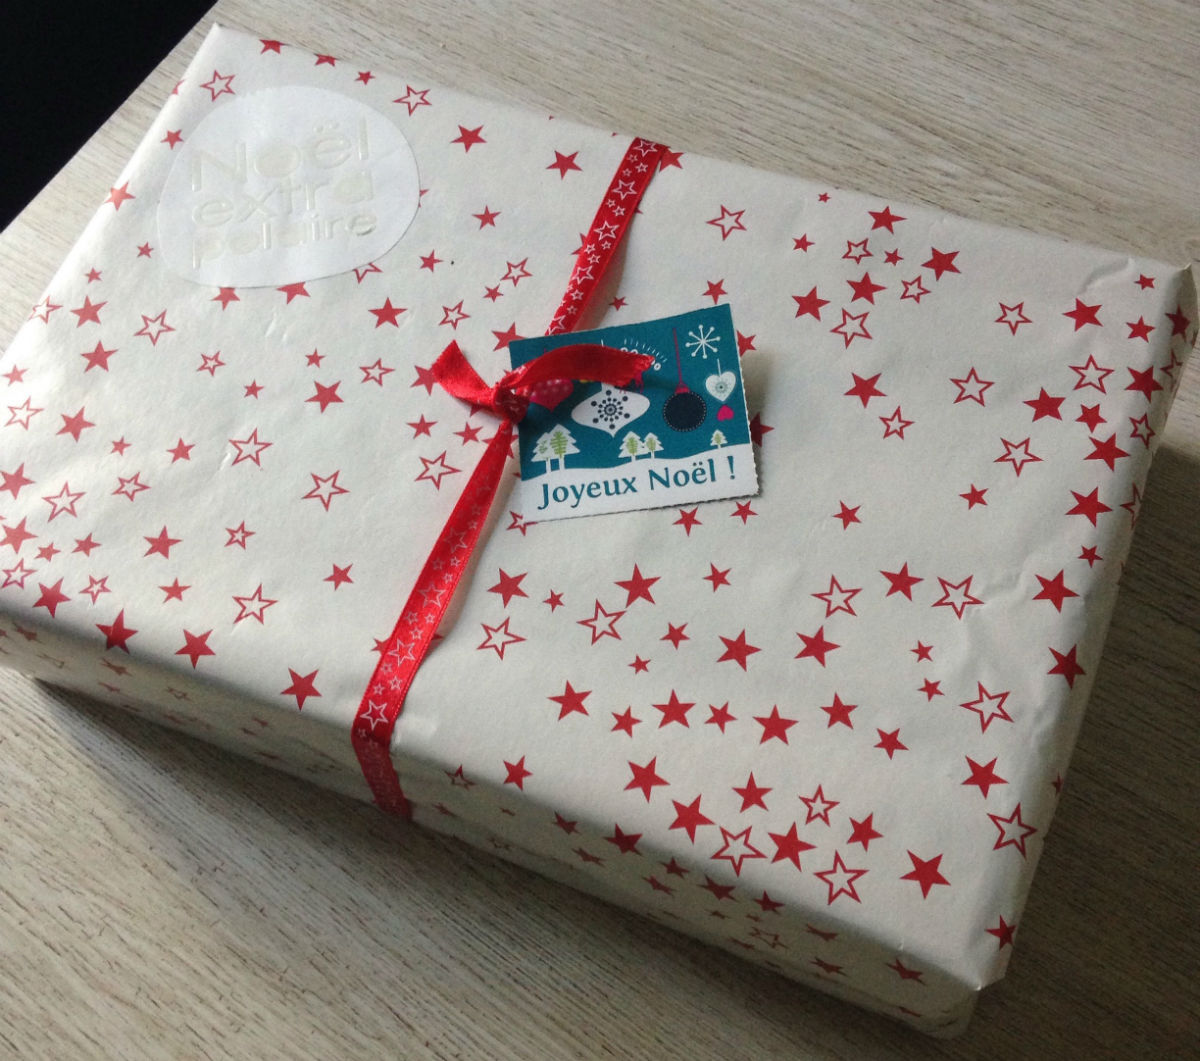 etoile emballage cadeau noel